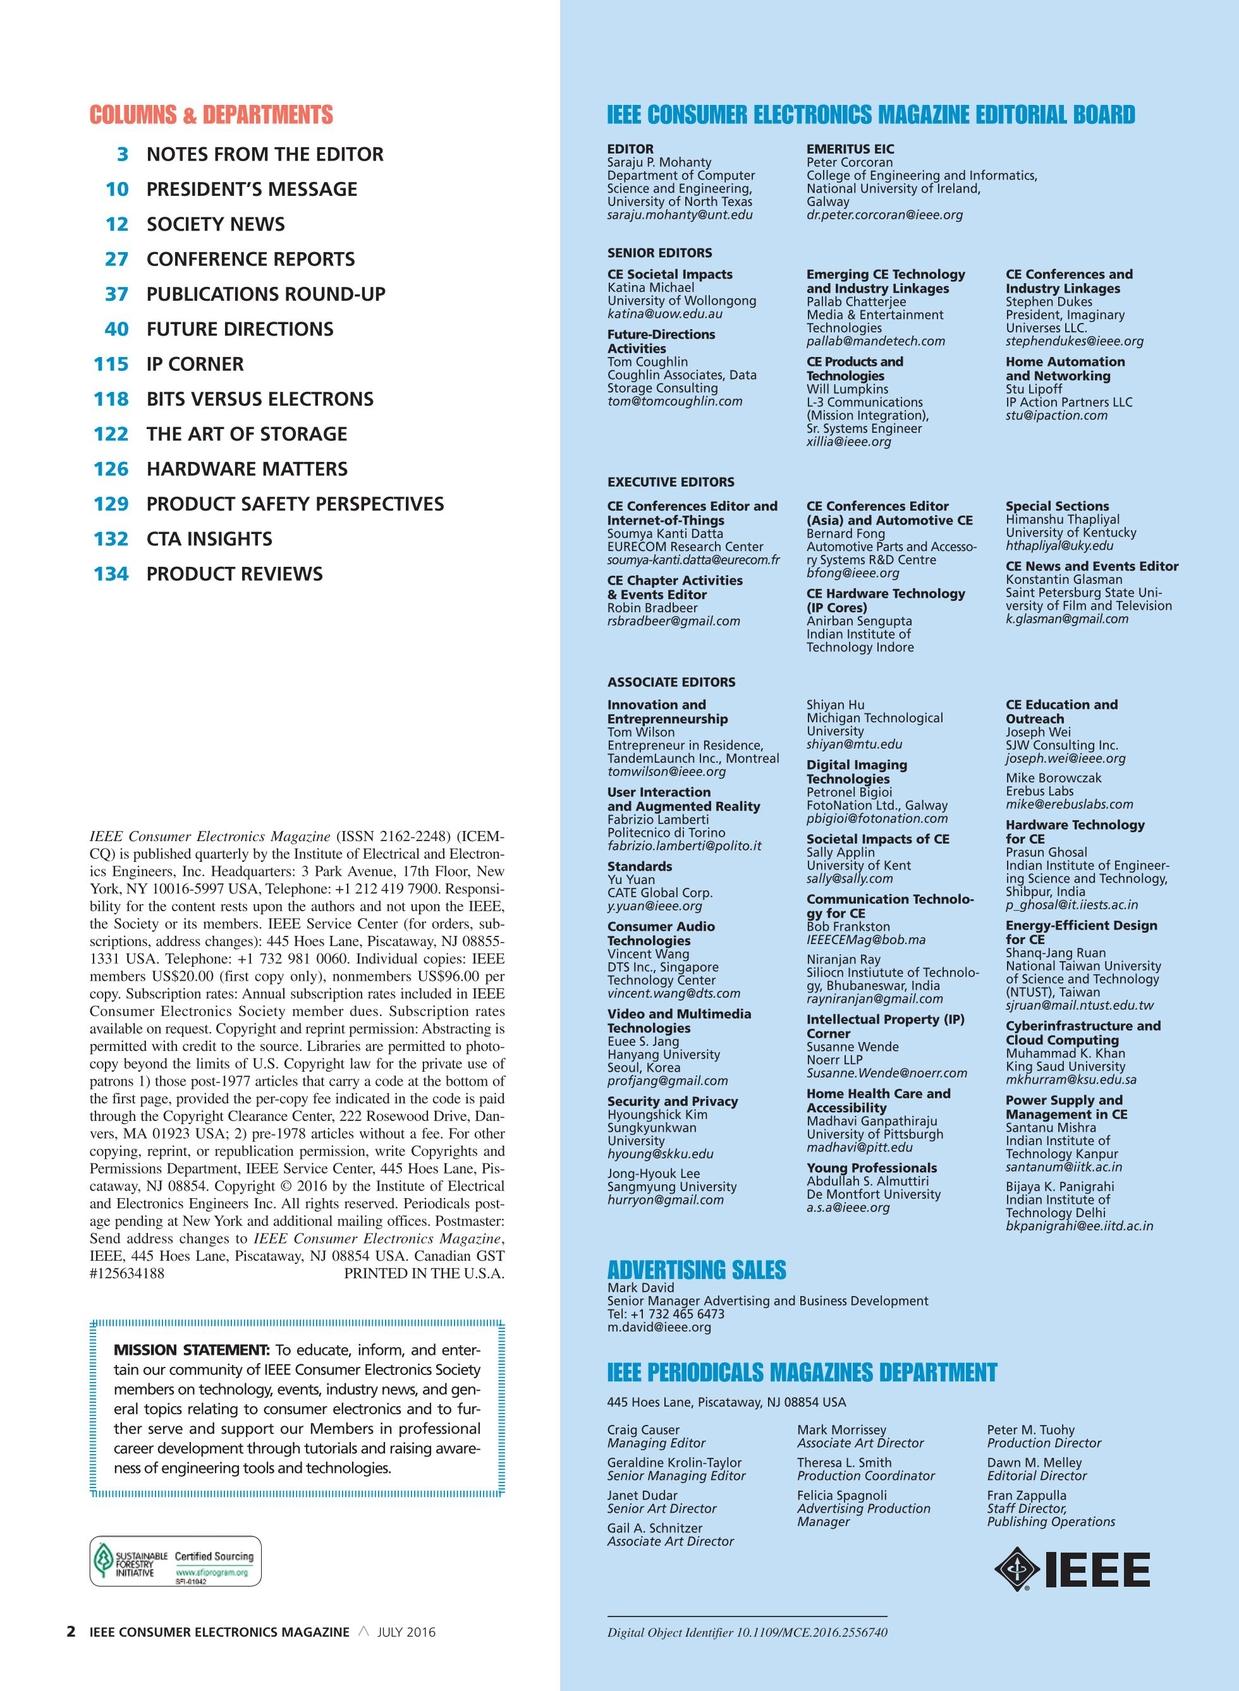 IEEE Consumer Electronics Magazine - July 2016